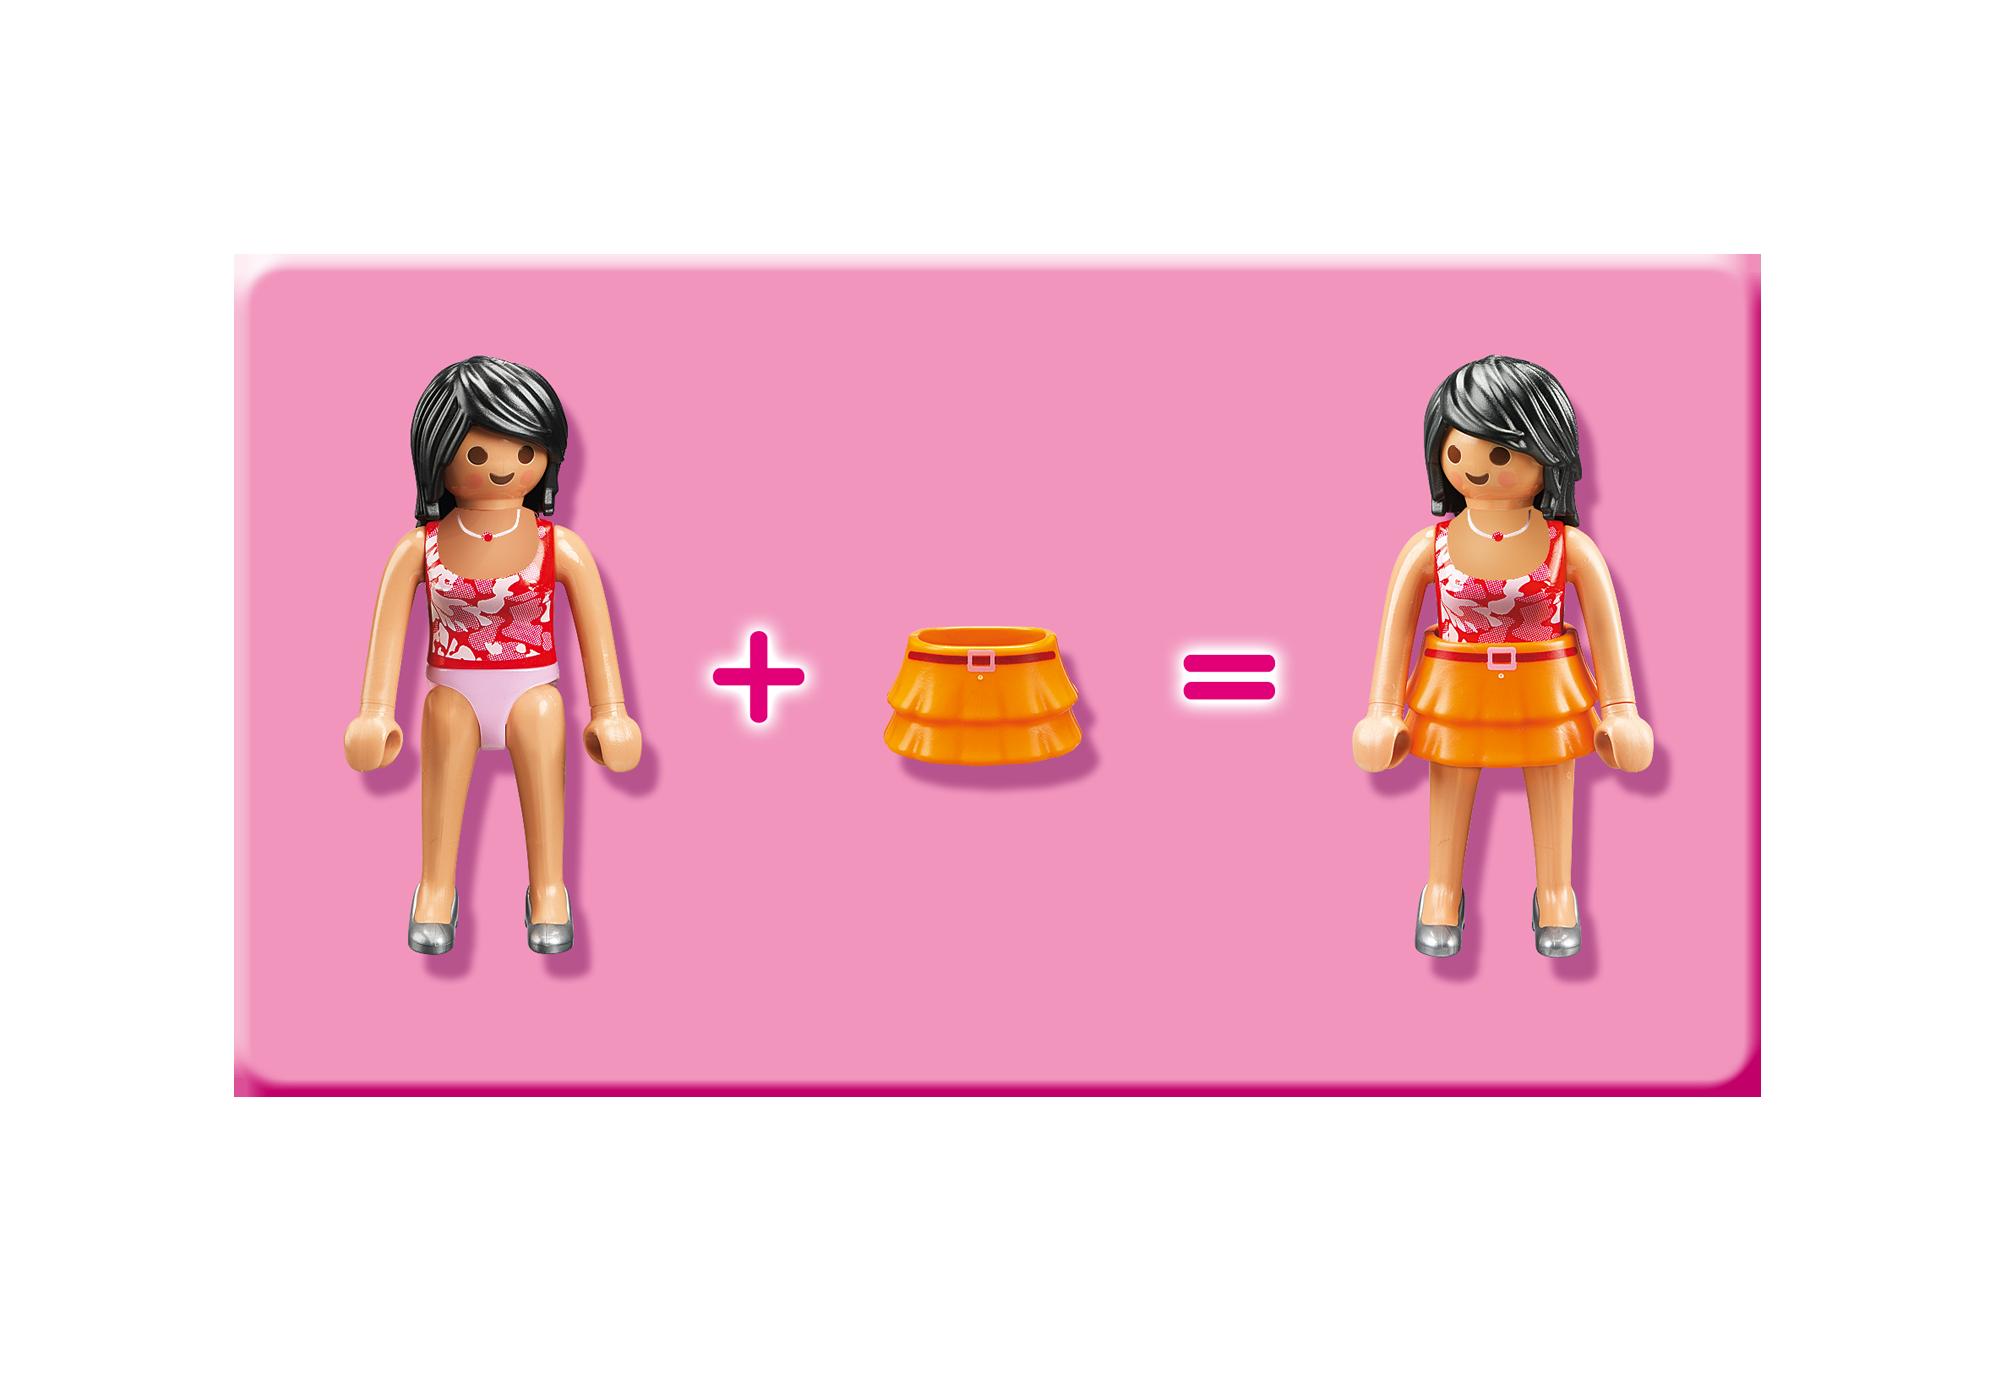 Http://media.playmobil.com/i/playmobil/5303_product_extra3/